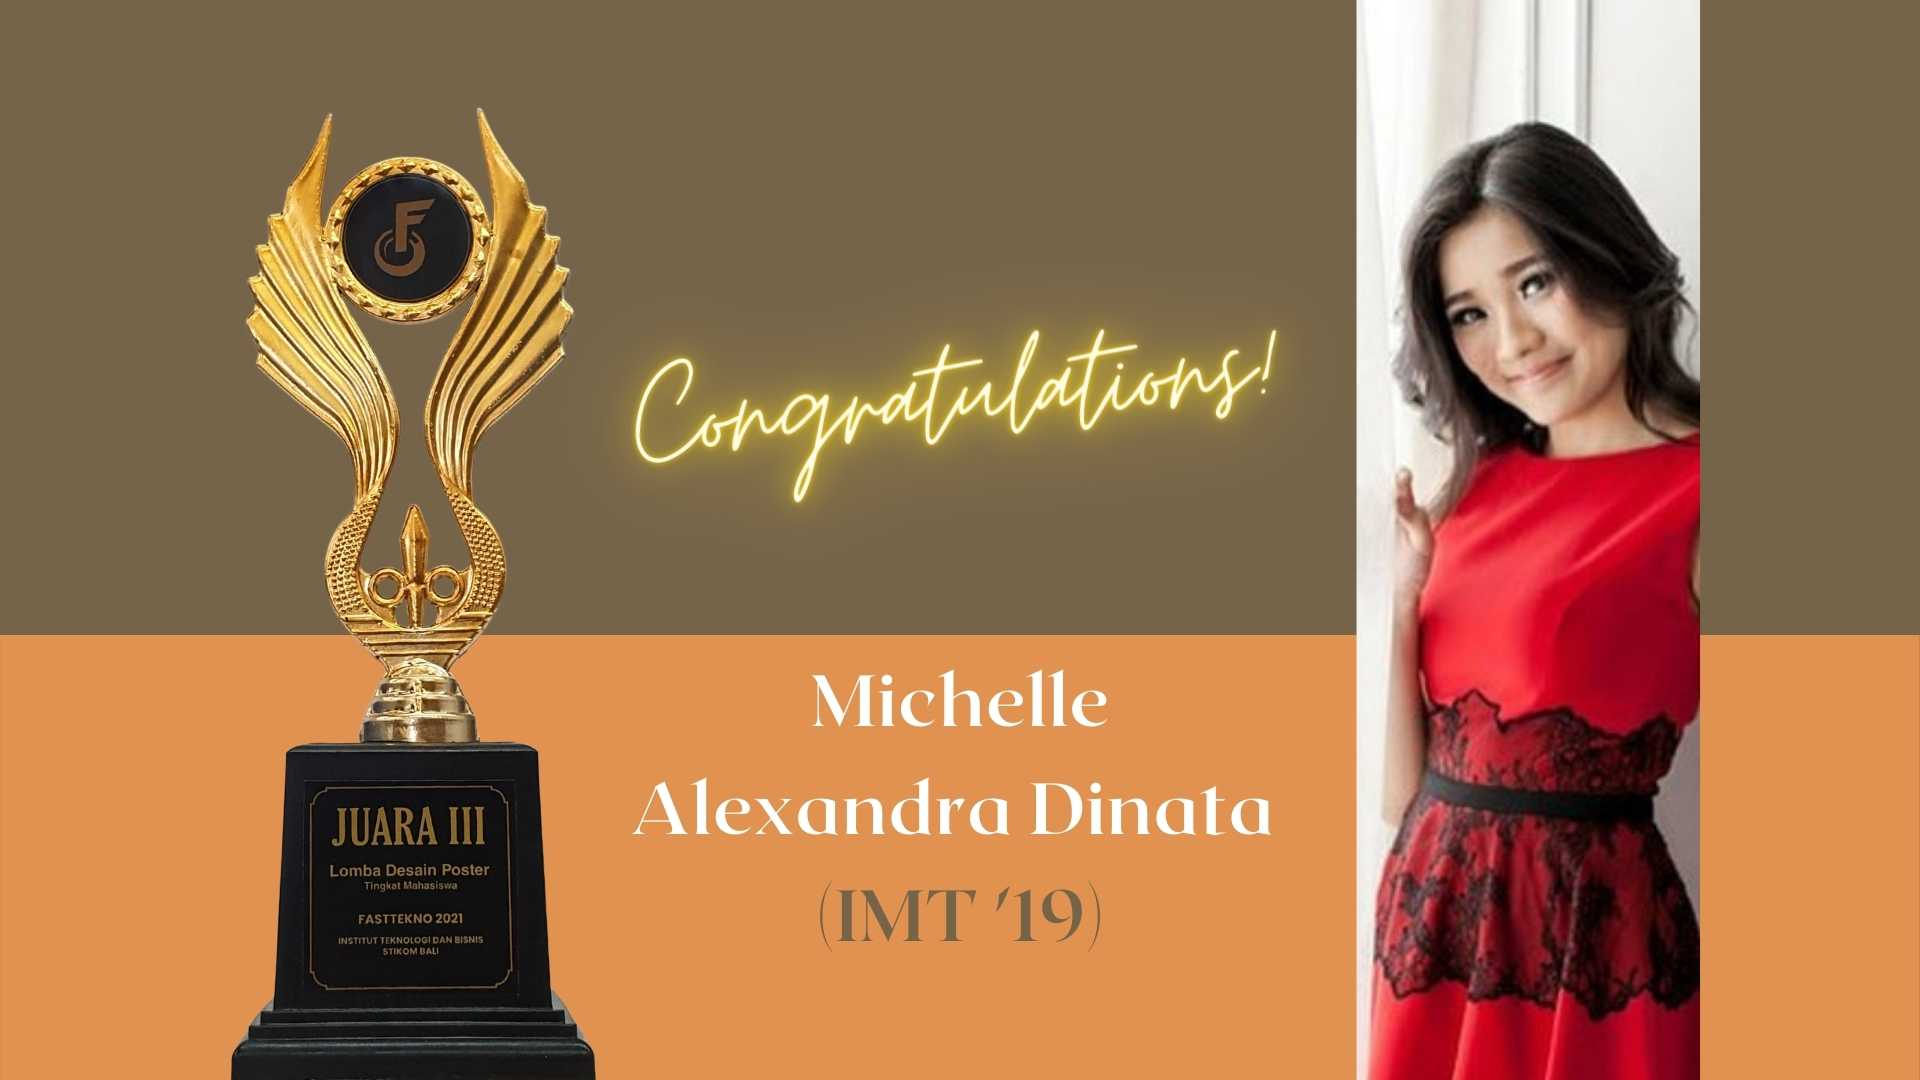 Michelle Juara III FastTekno 2021 - Kategori Poster